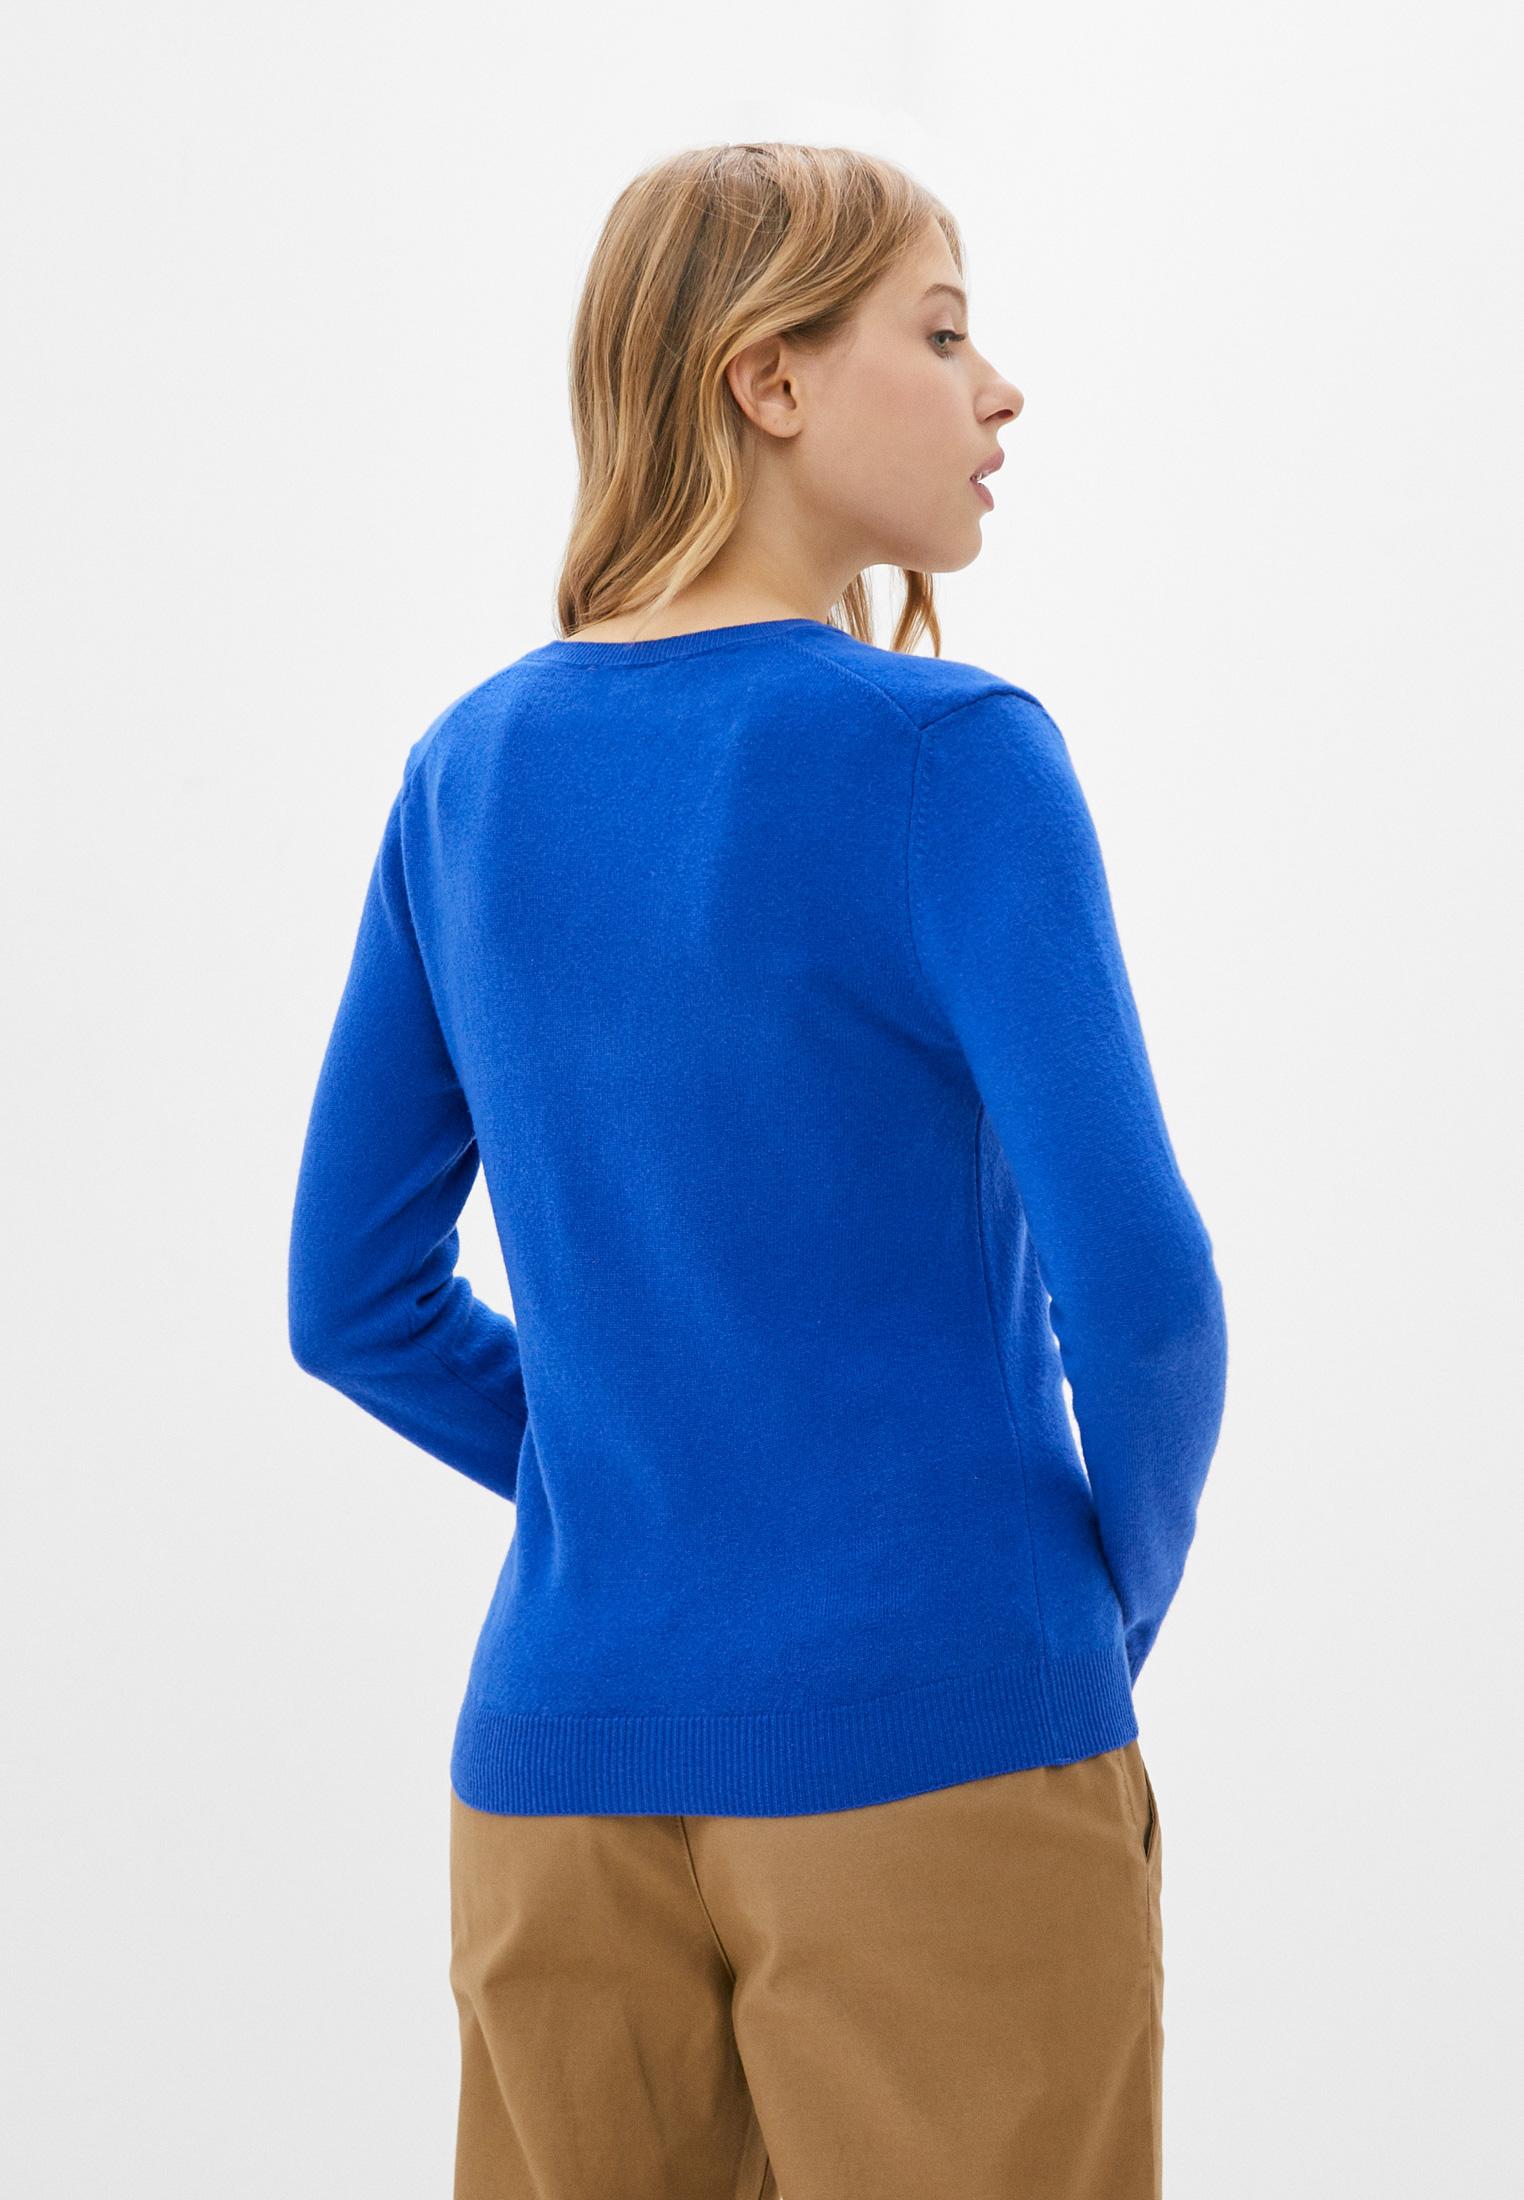 Пуловер United Colors of Benetton (Юнайтед Колорс оф Бенеттон) 1002D4488: изображение 6